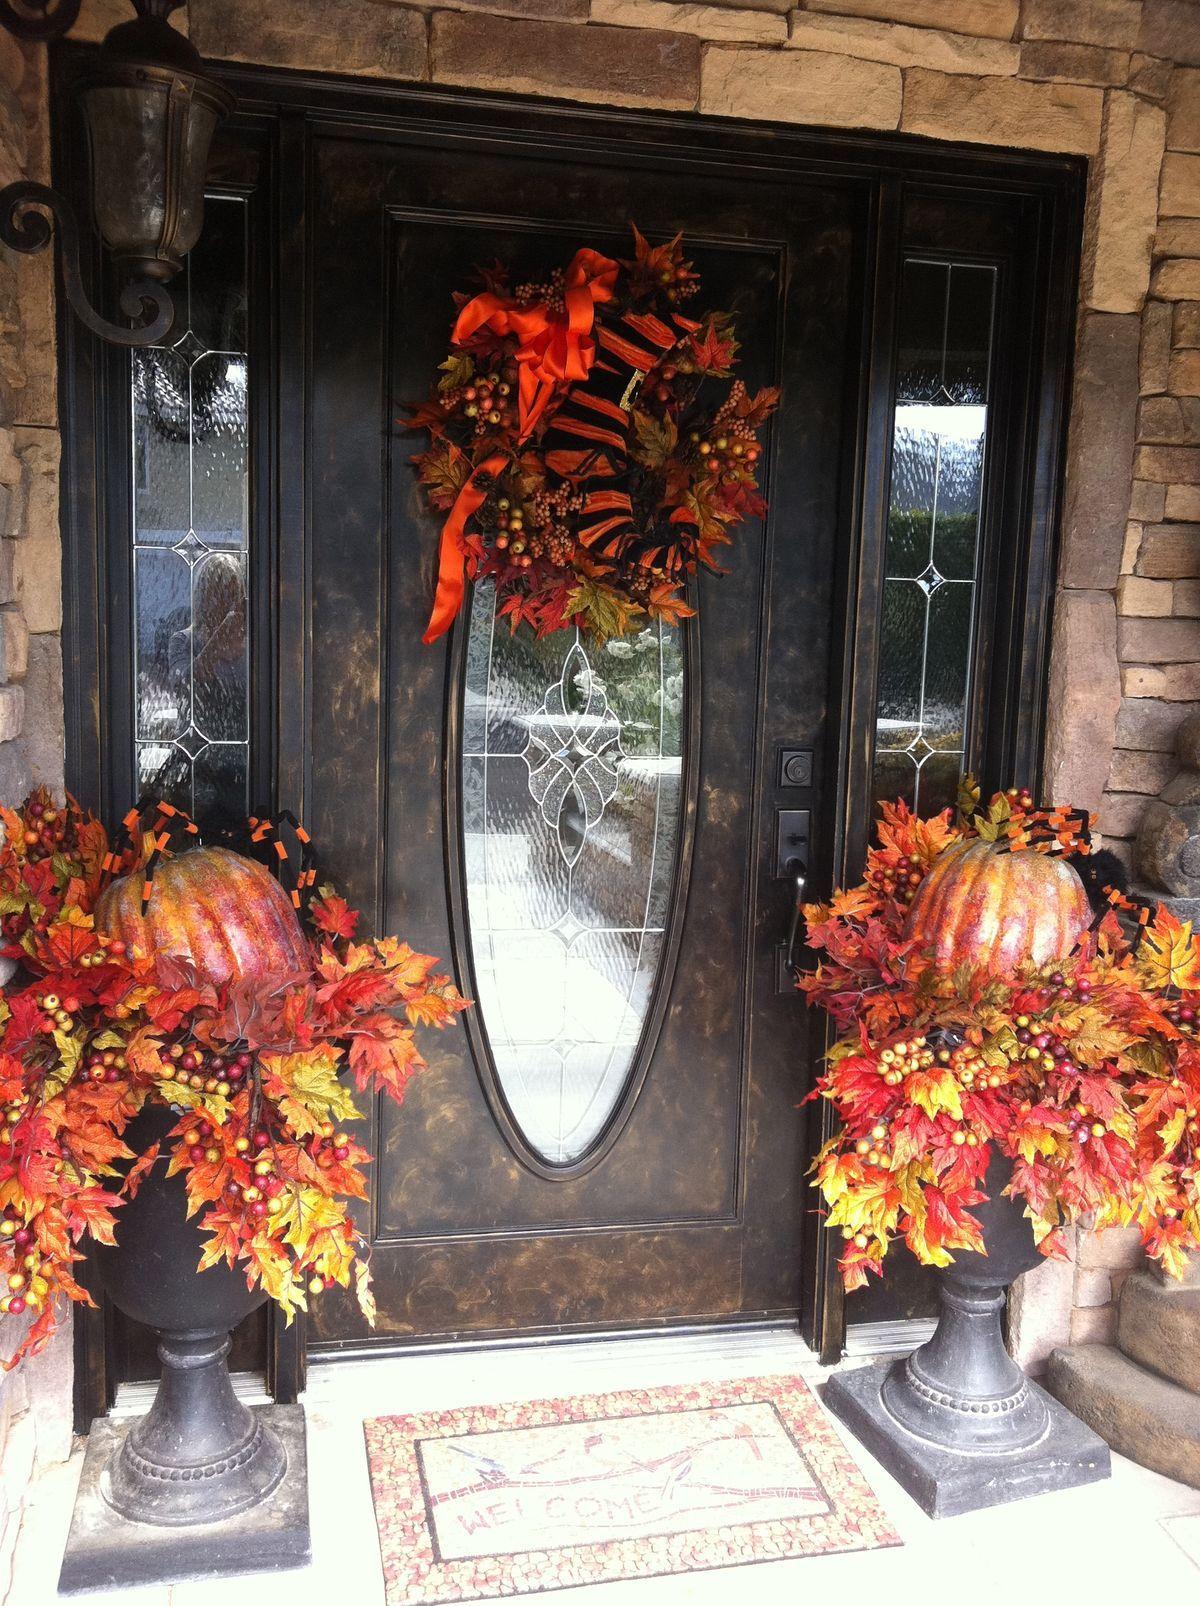 Pin by Chellie Hailes on Autumn Splendor Pinterest Fall decor - halloween front door decor